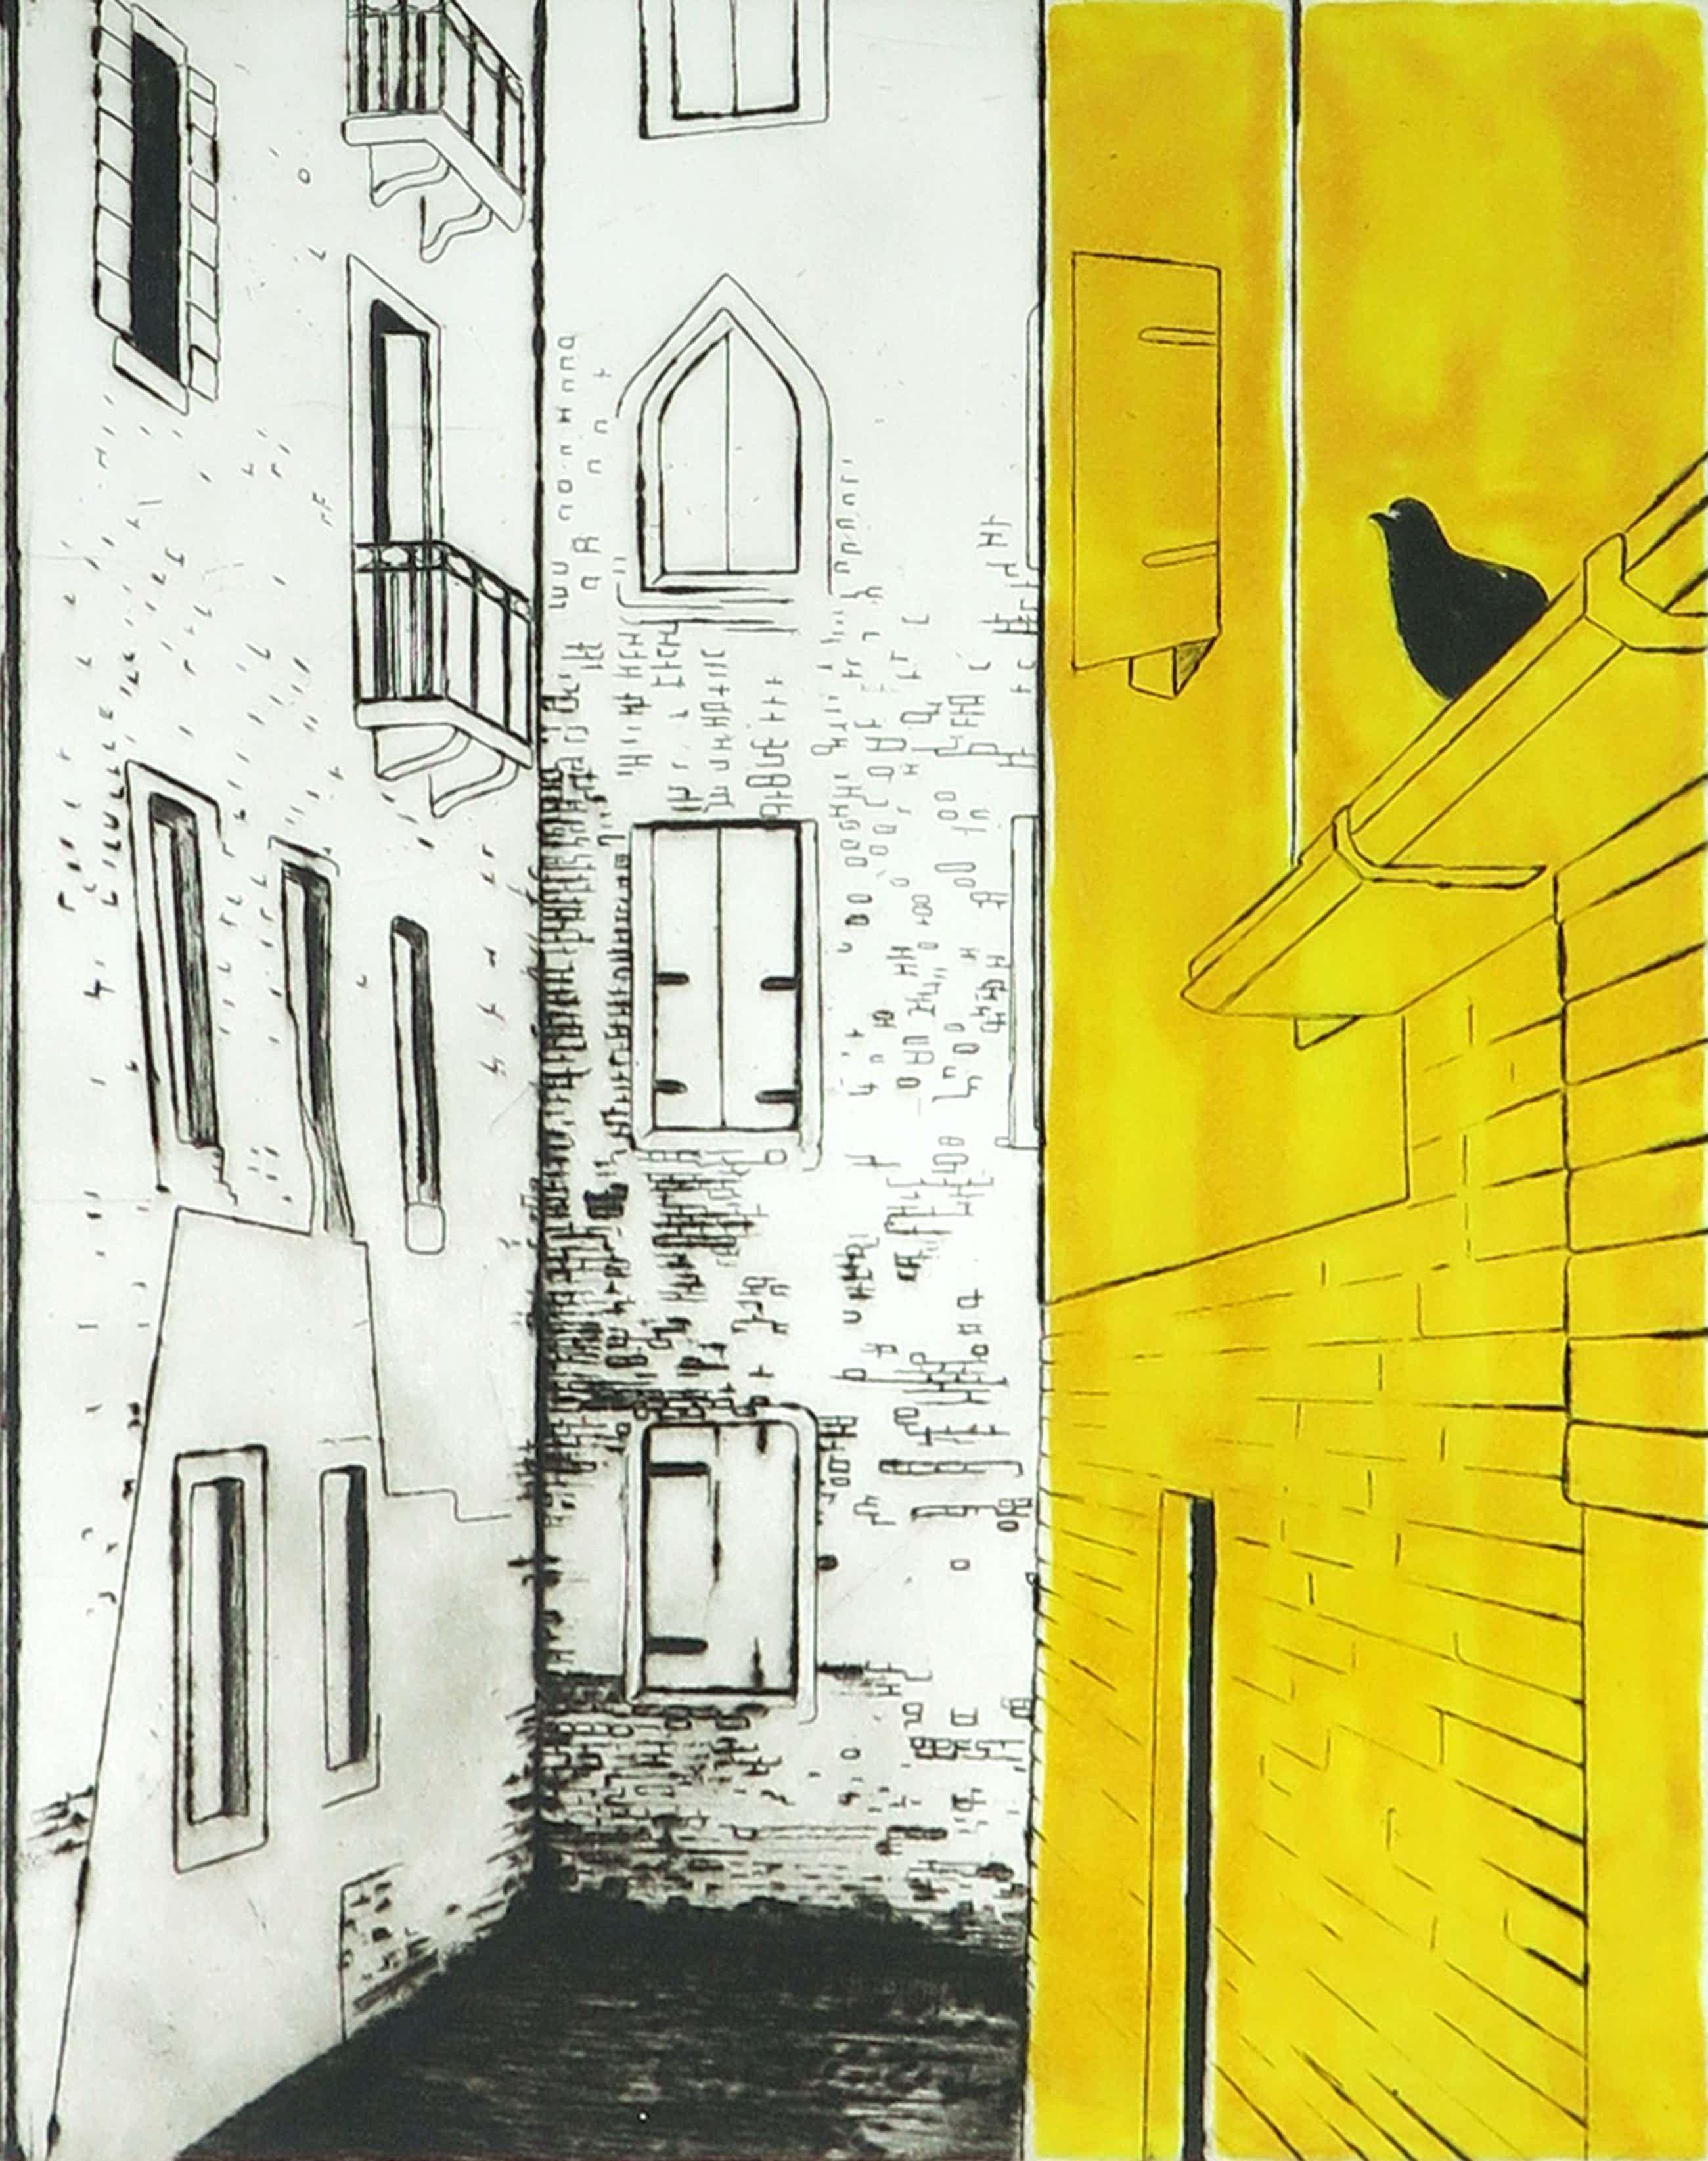 Margeritha Pianarosa - Ets, Venezia 9 - Ingelijst kopen? Bied vanaf 70!